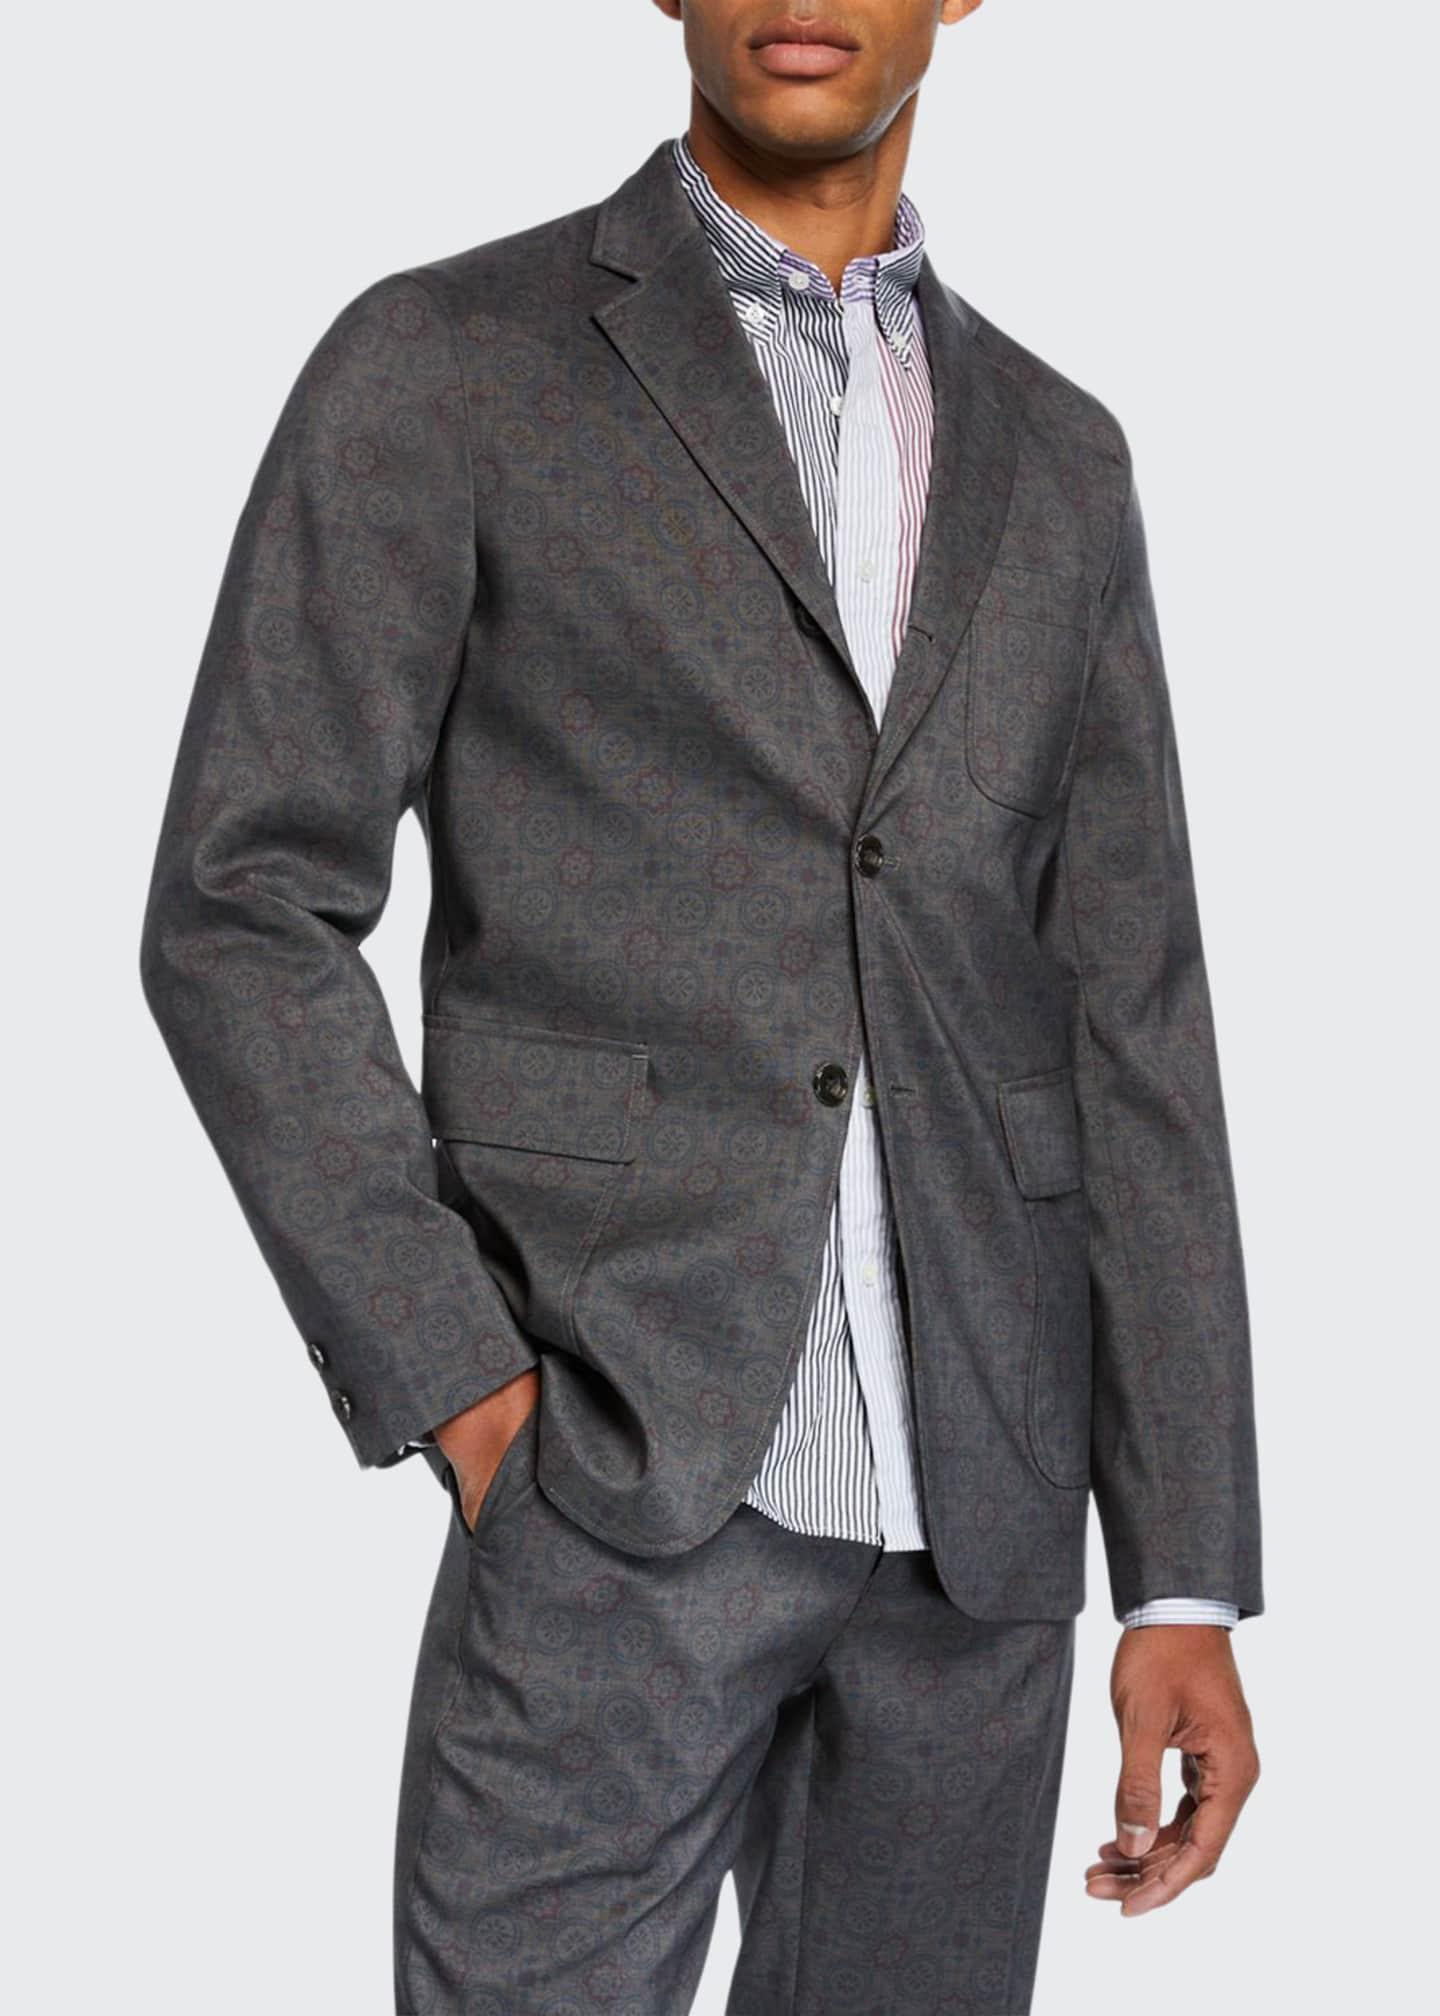 Beams Plus Men's Geometric-Print Three-Button Jacket